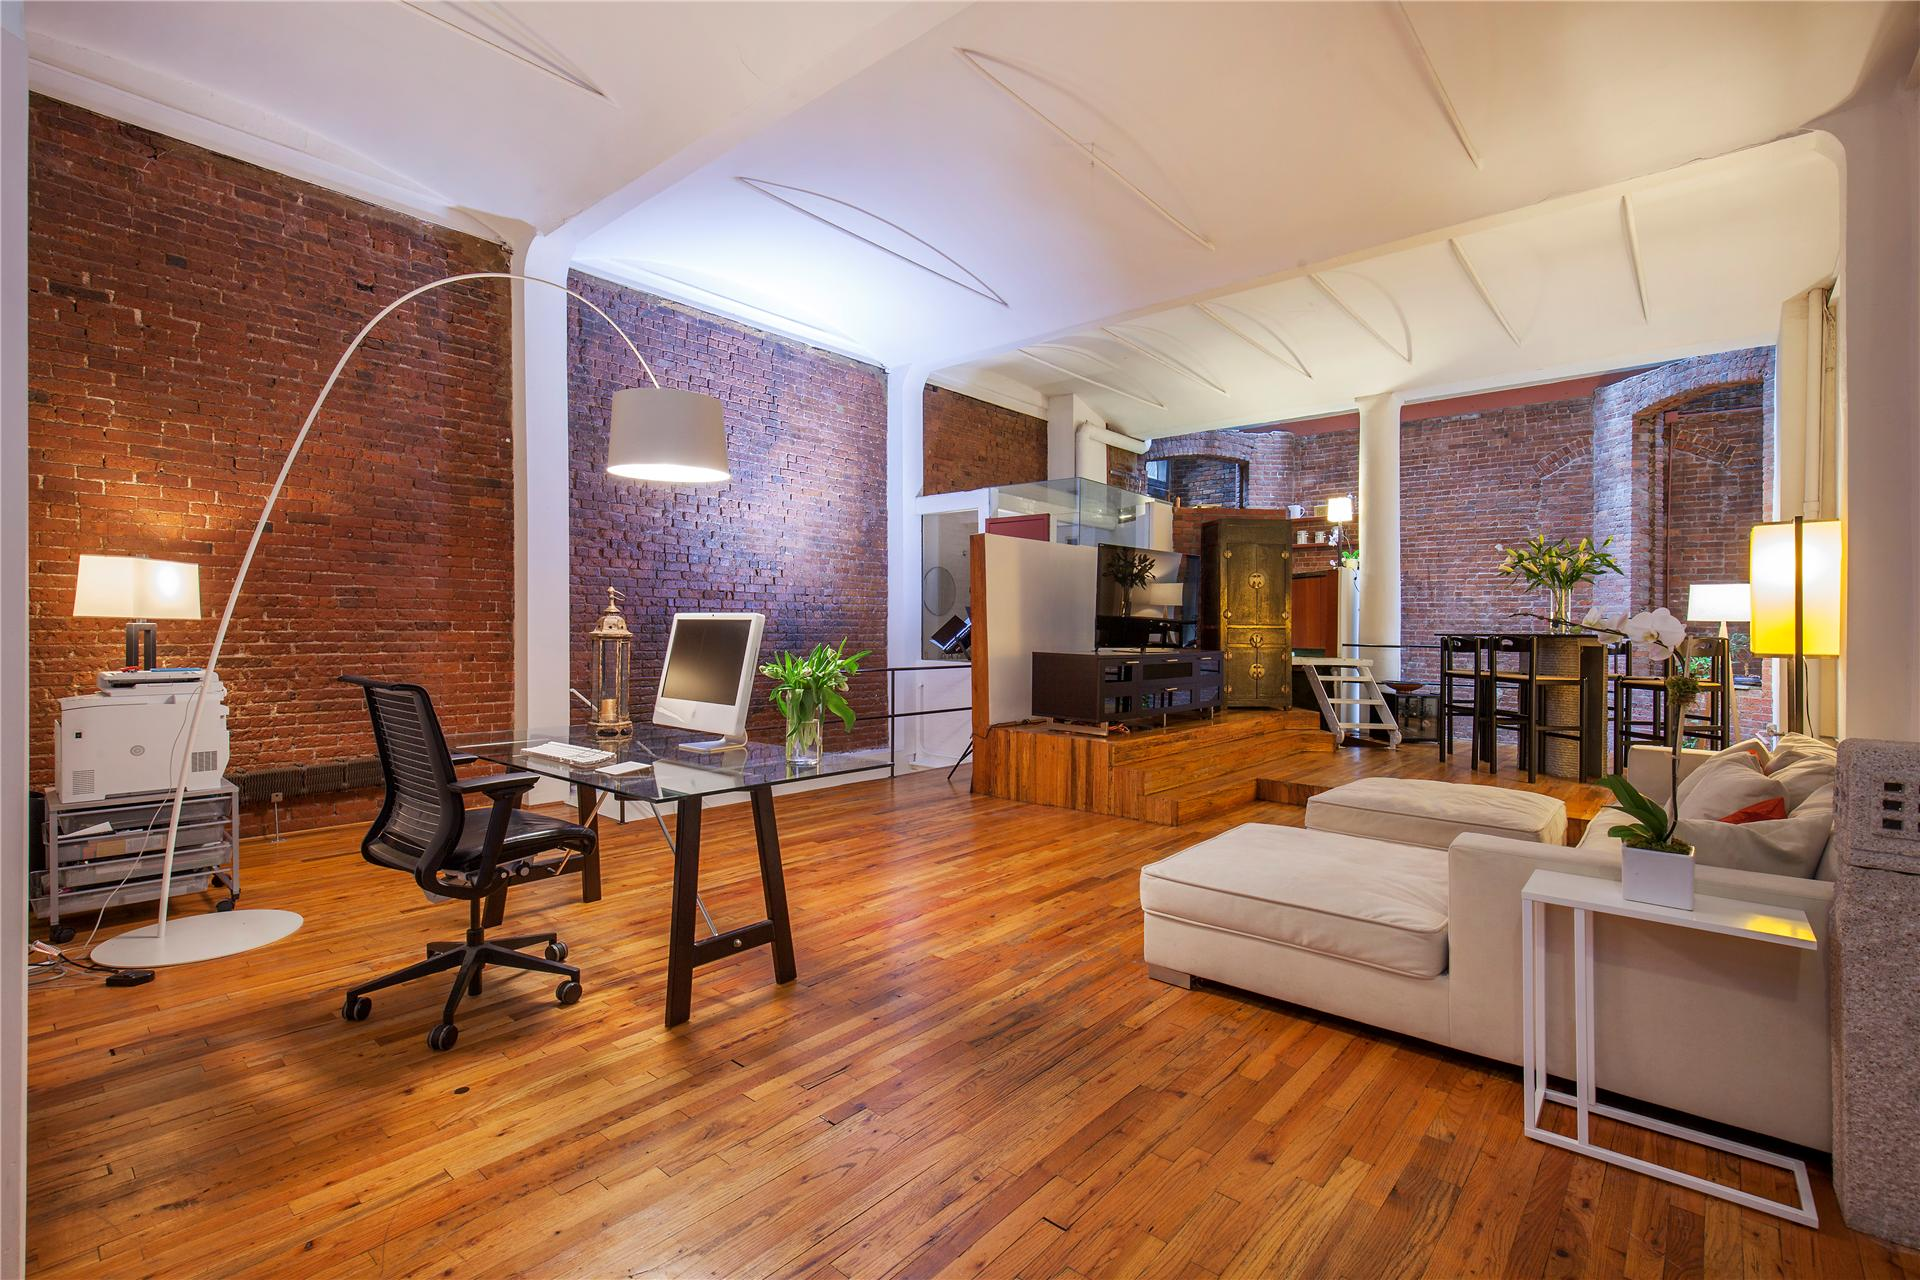 156 Franklin Street, 1R - TriBeCa, New York